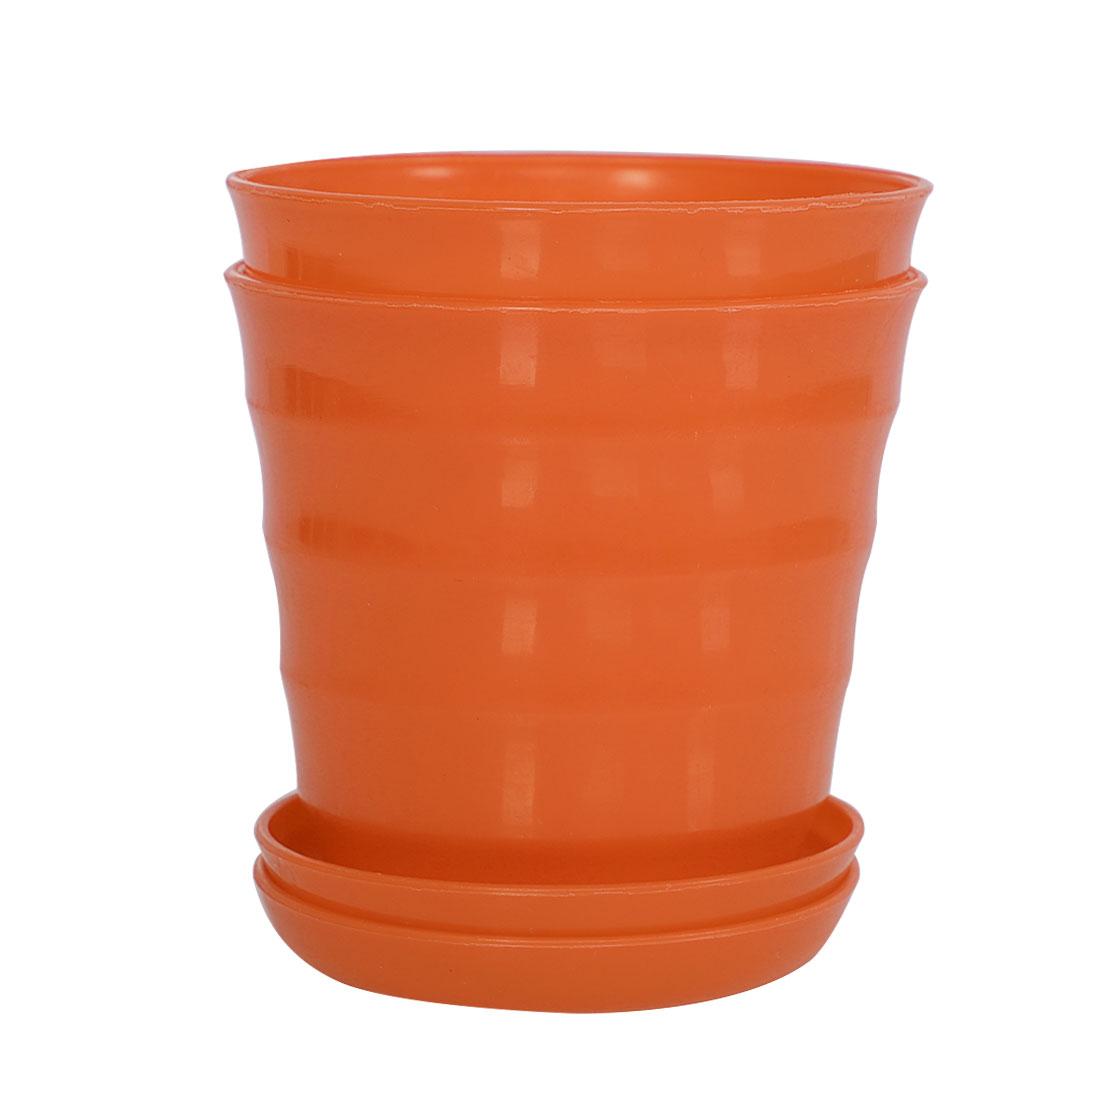 Apartment Desktop Plastic Round Cactus Plant Flower Seed Pot Tray Holder Orange 2pcs